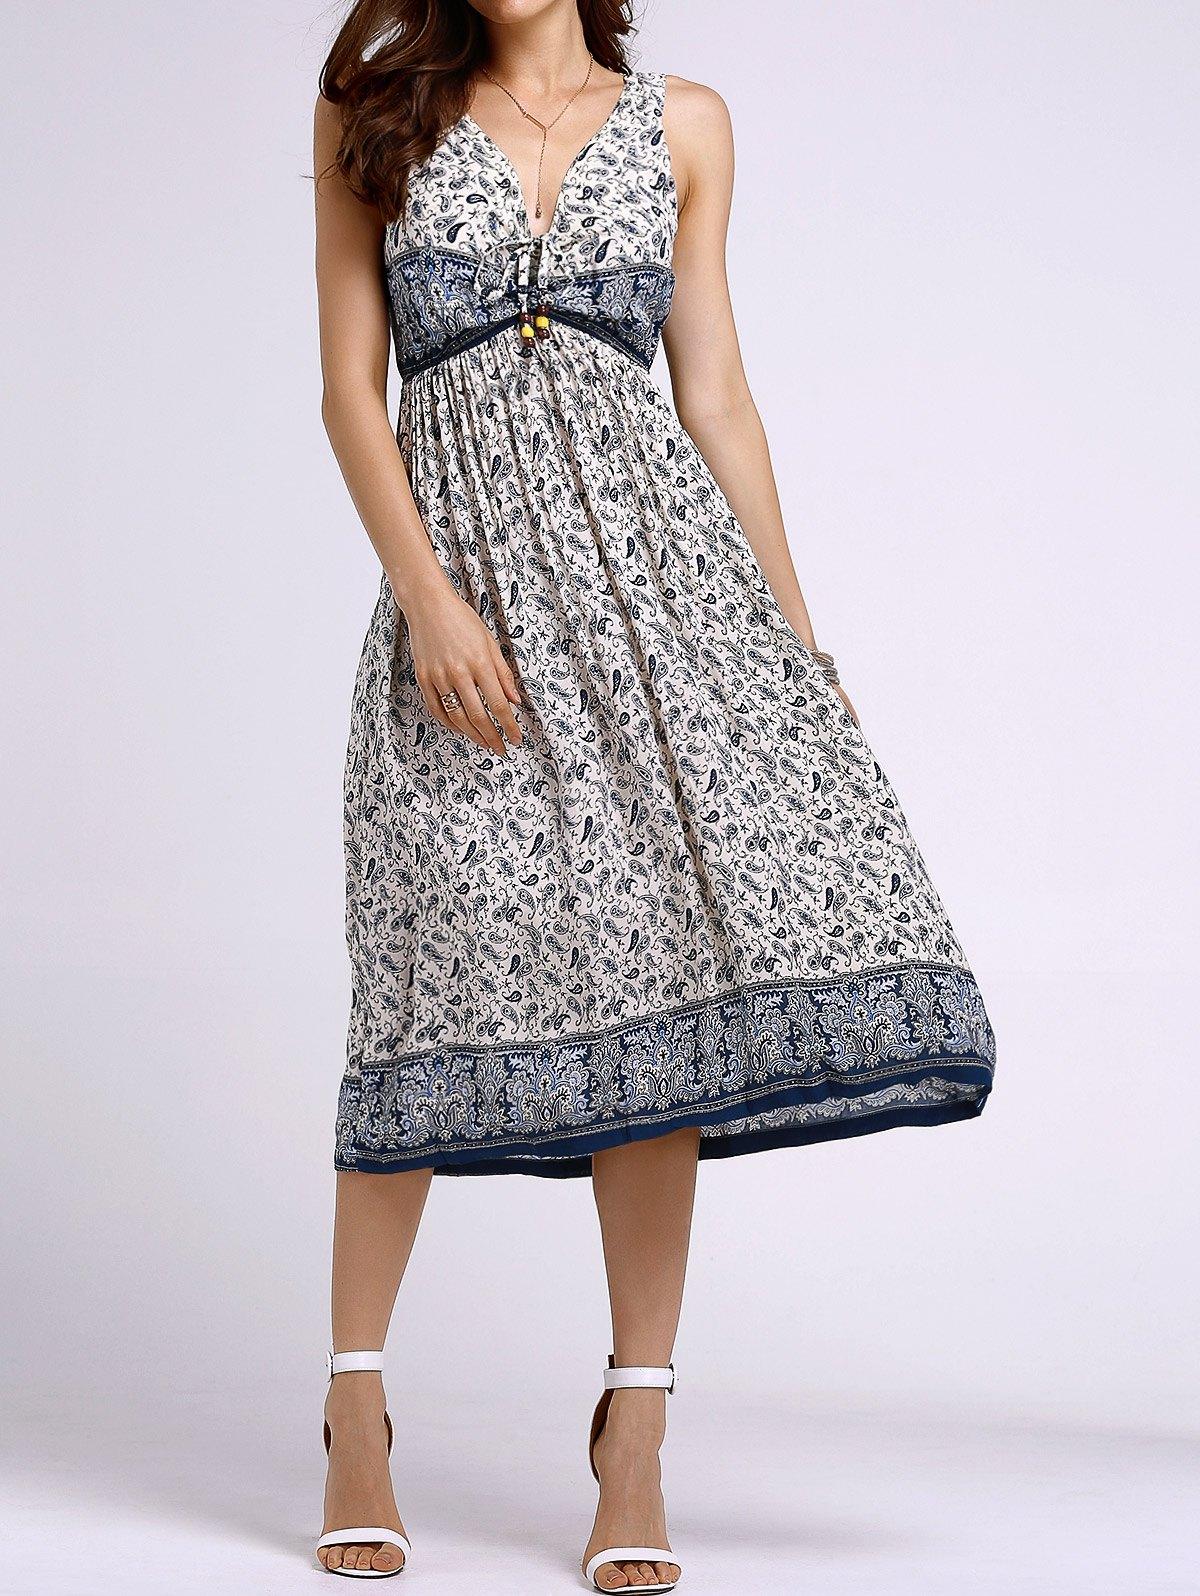 Bohemian Printed Round Neck Sleeveless Dress